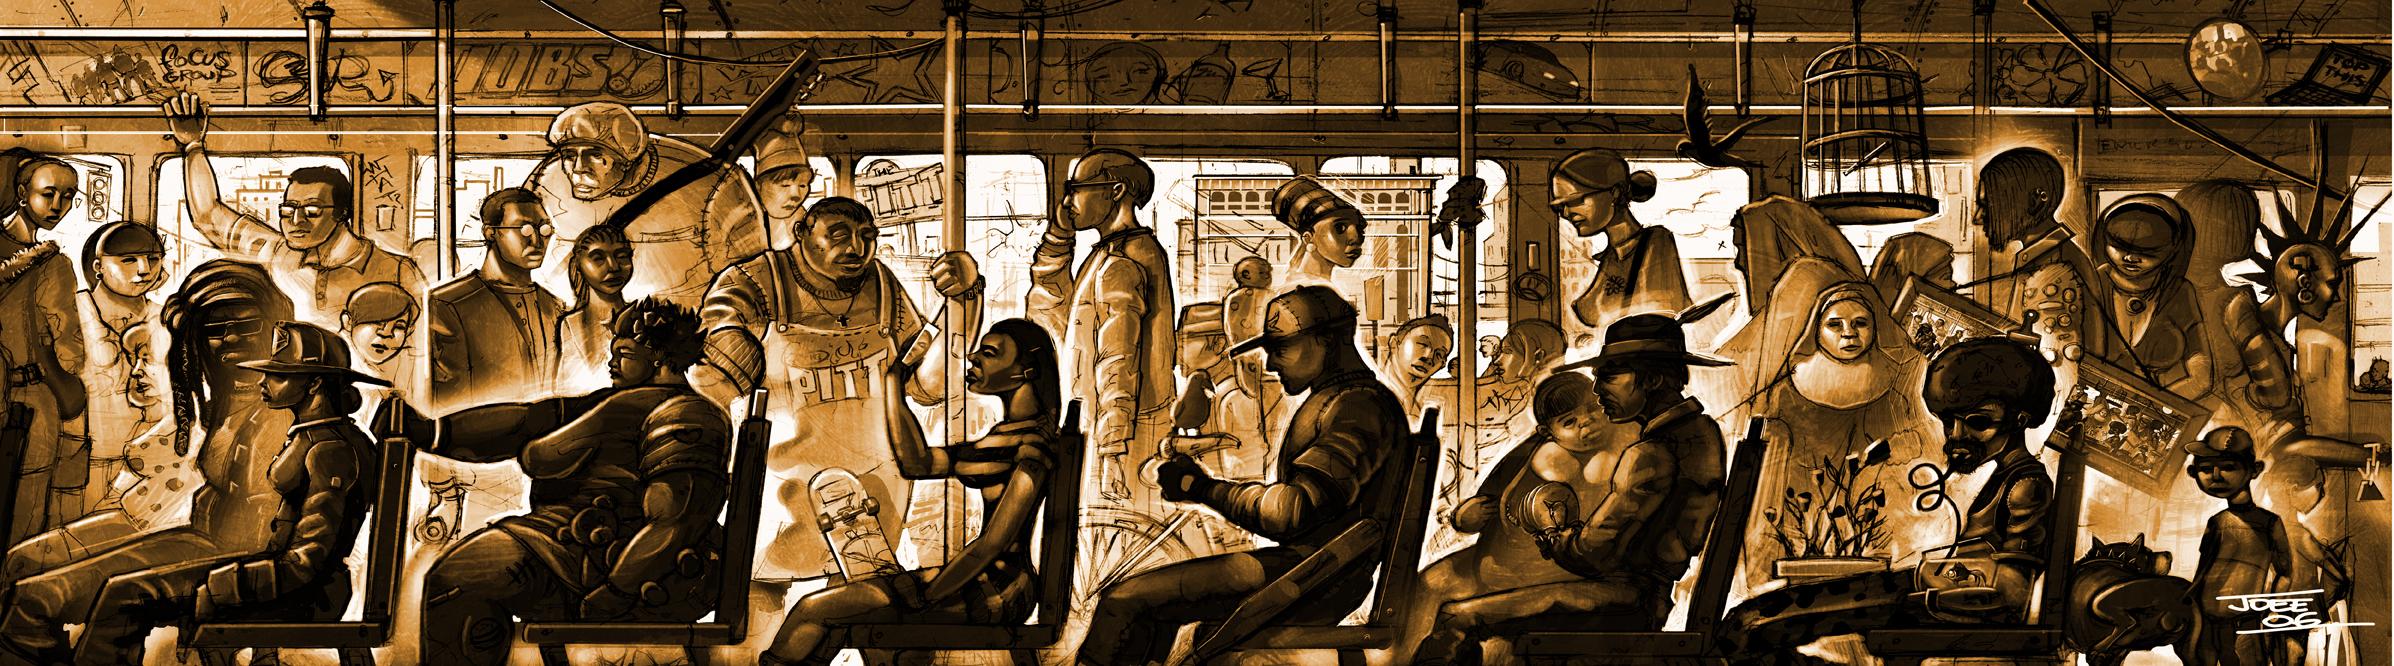 Bus Ride II